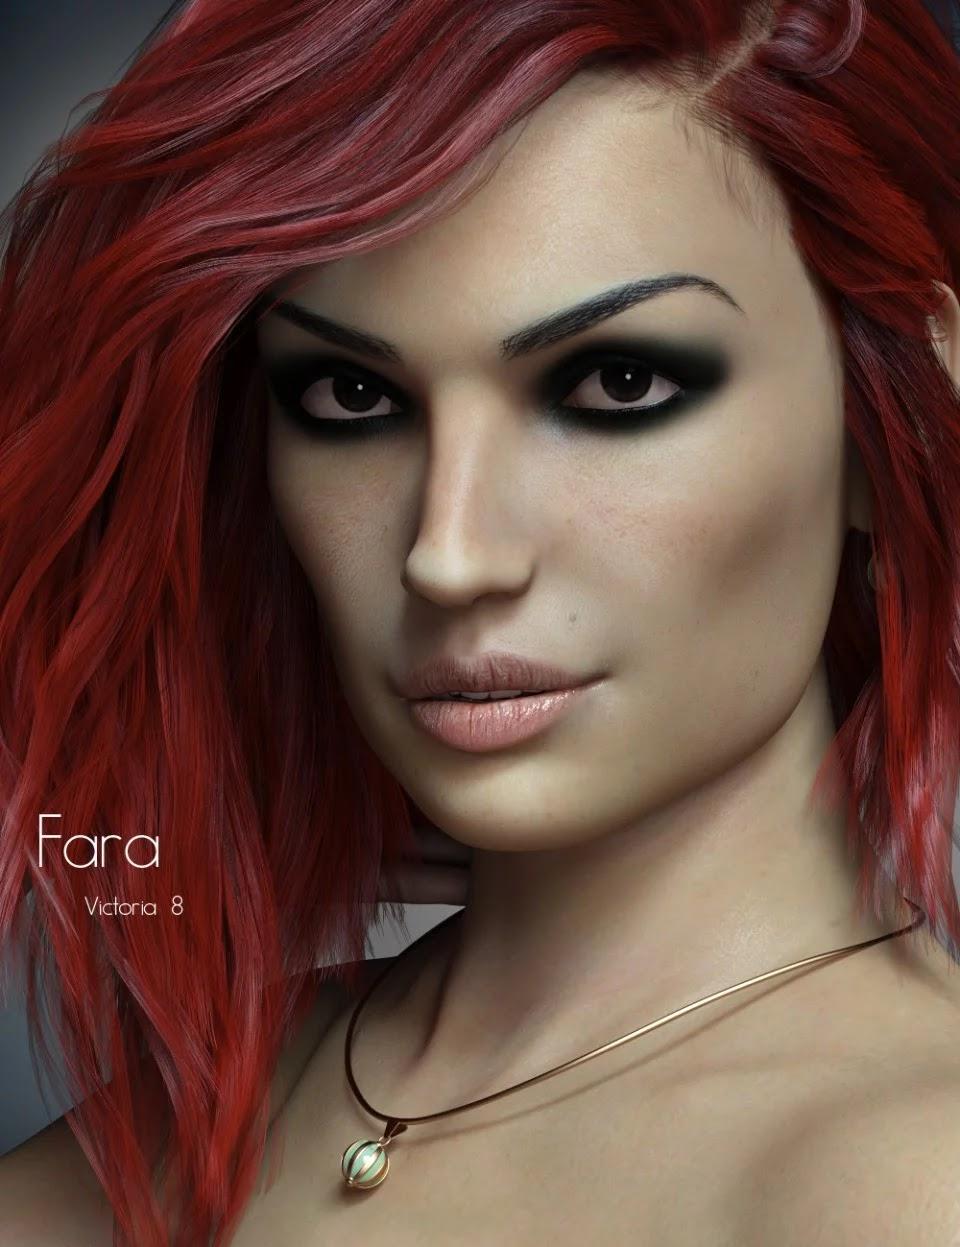 P3D Fara for Victoria 8_DAZ3D下载站